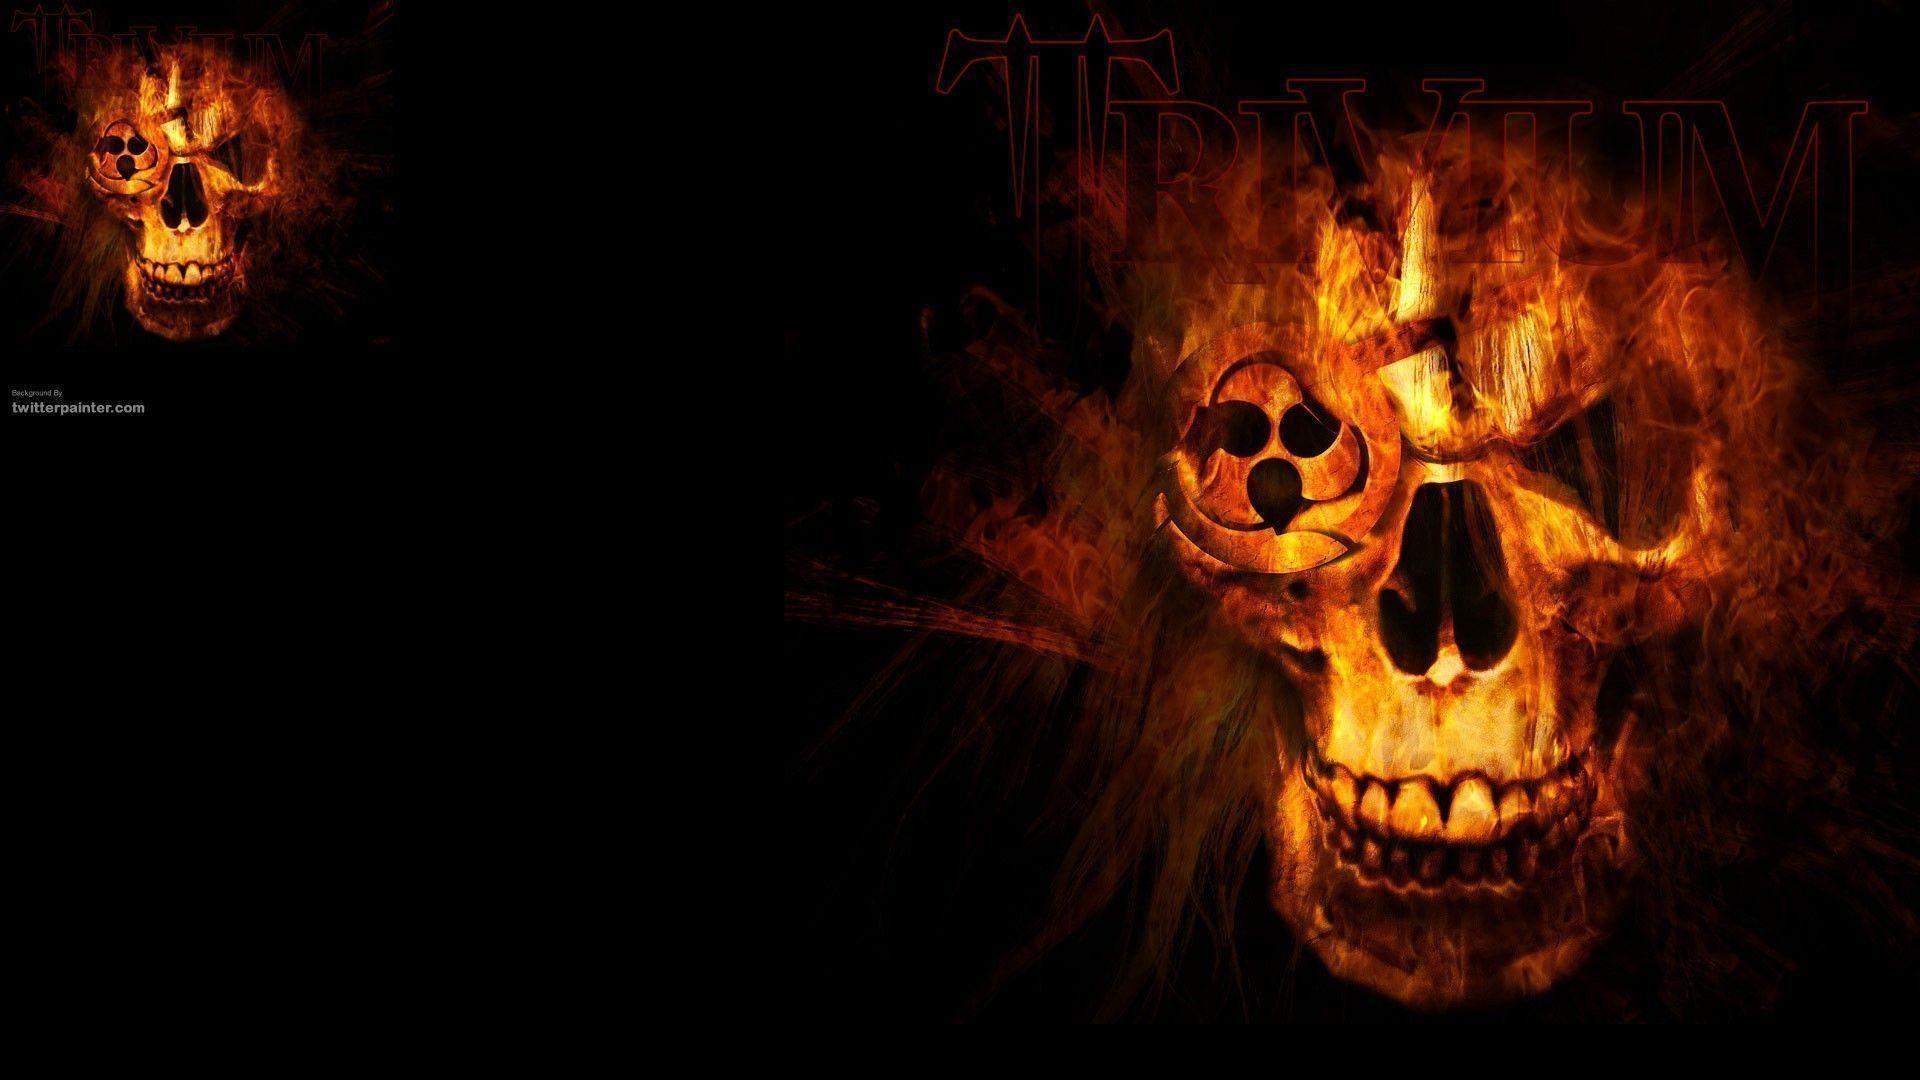 Skull Wallpaper – Wallpapers Browse